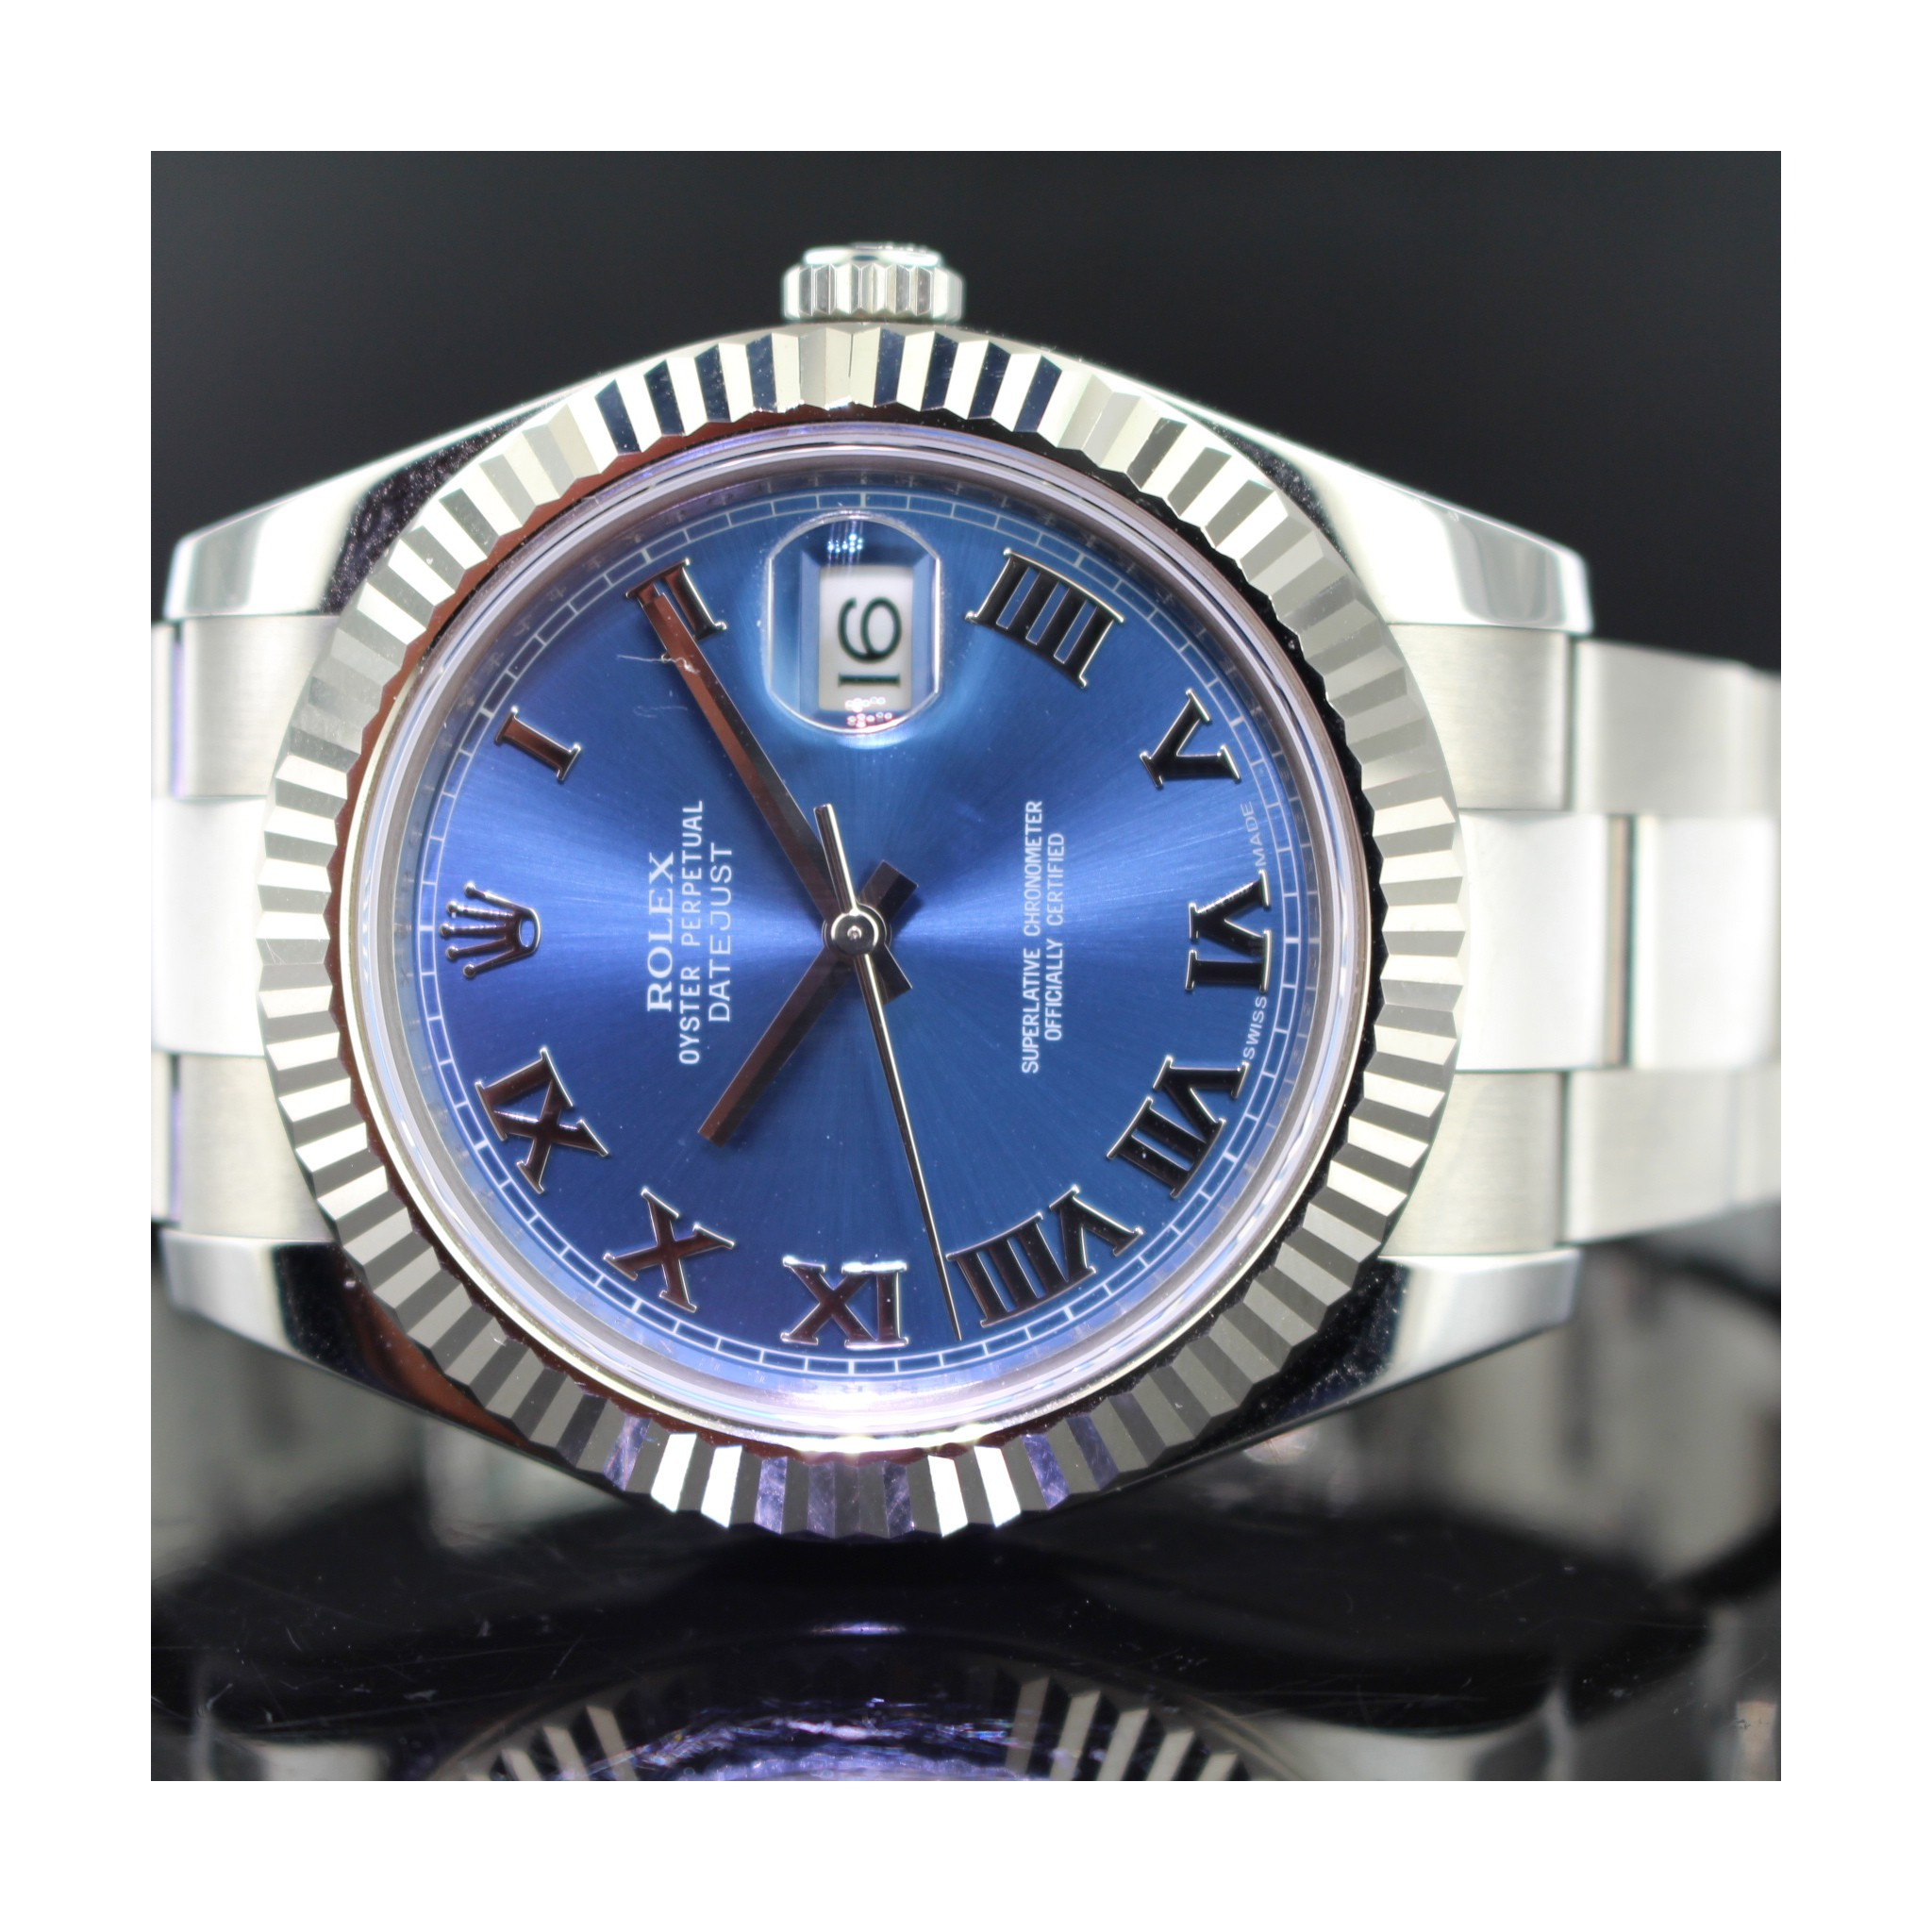 Rolex Datejust II | Riccione